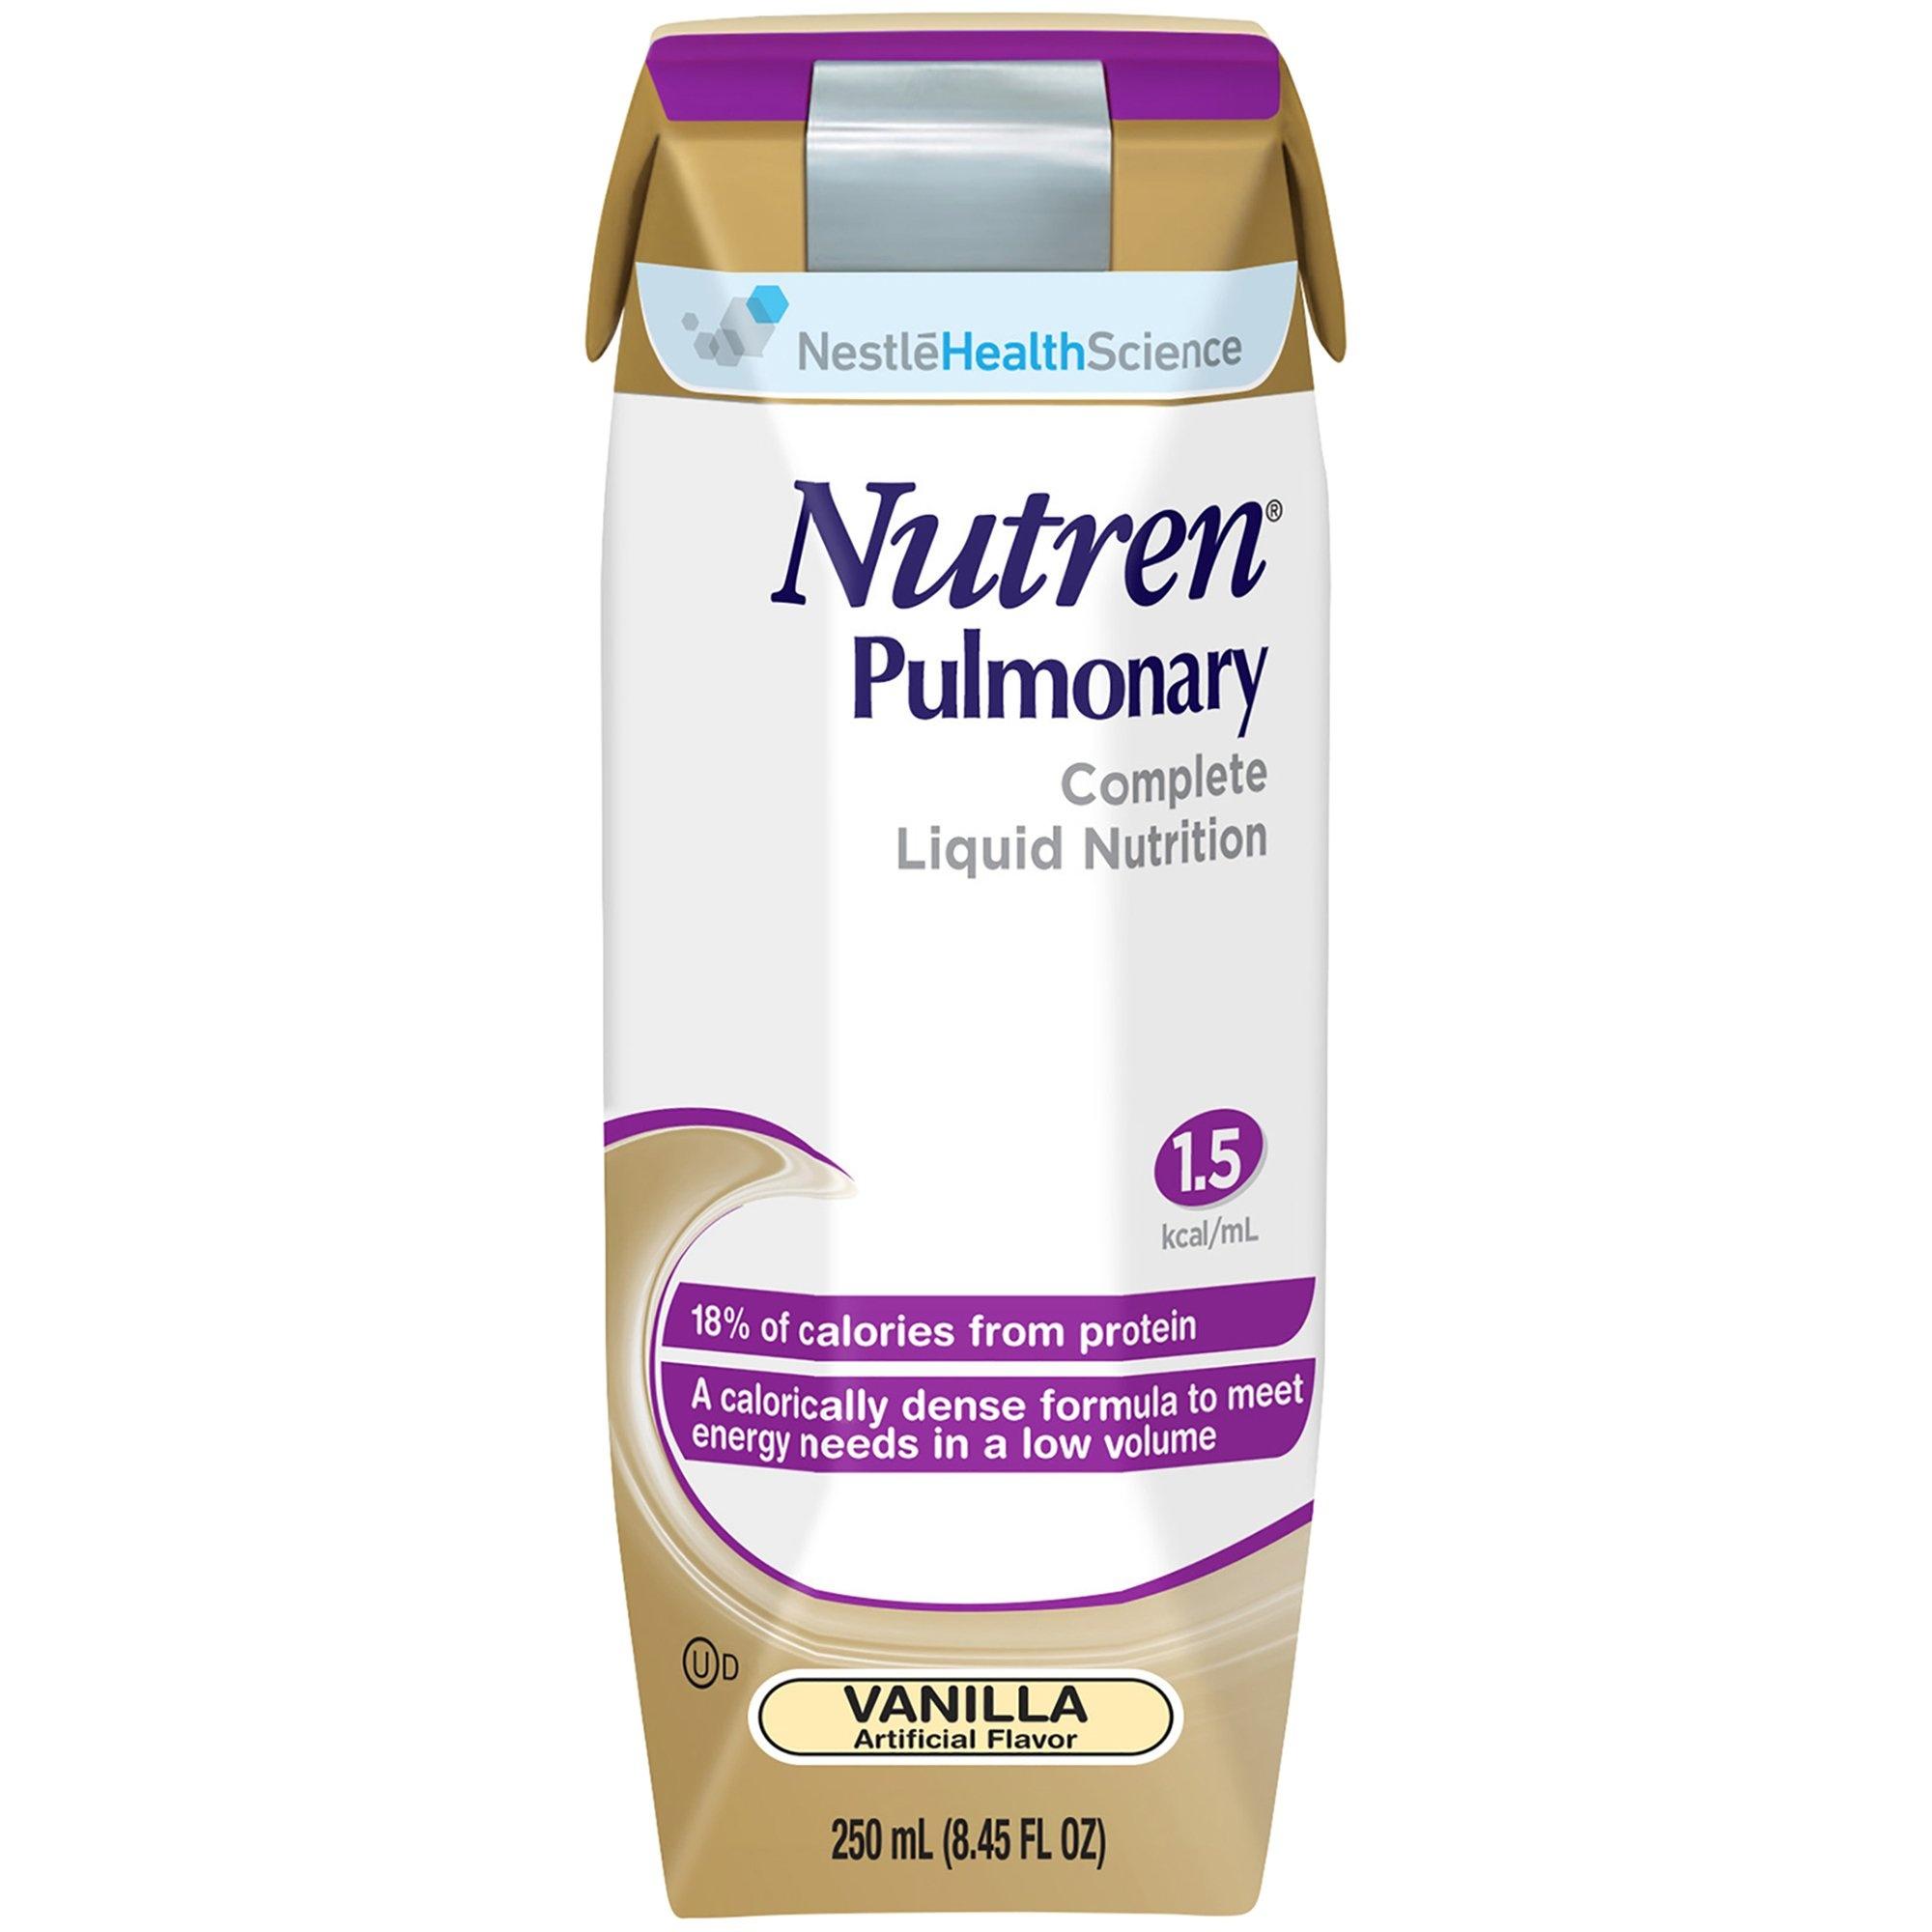 Nestle HealthScience Nutren Pulmonary Complete Liquid Nutrition Oral Supplement/Tube Feeding Formula, Vanilla, 250 mL, 00798716164801, 1 Each